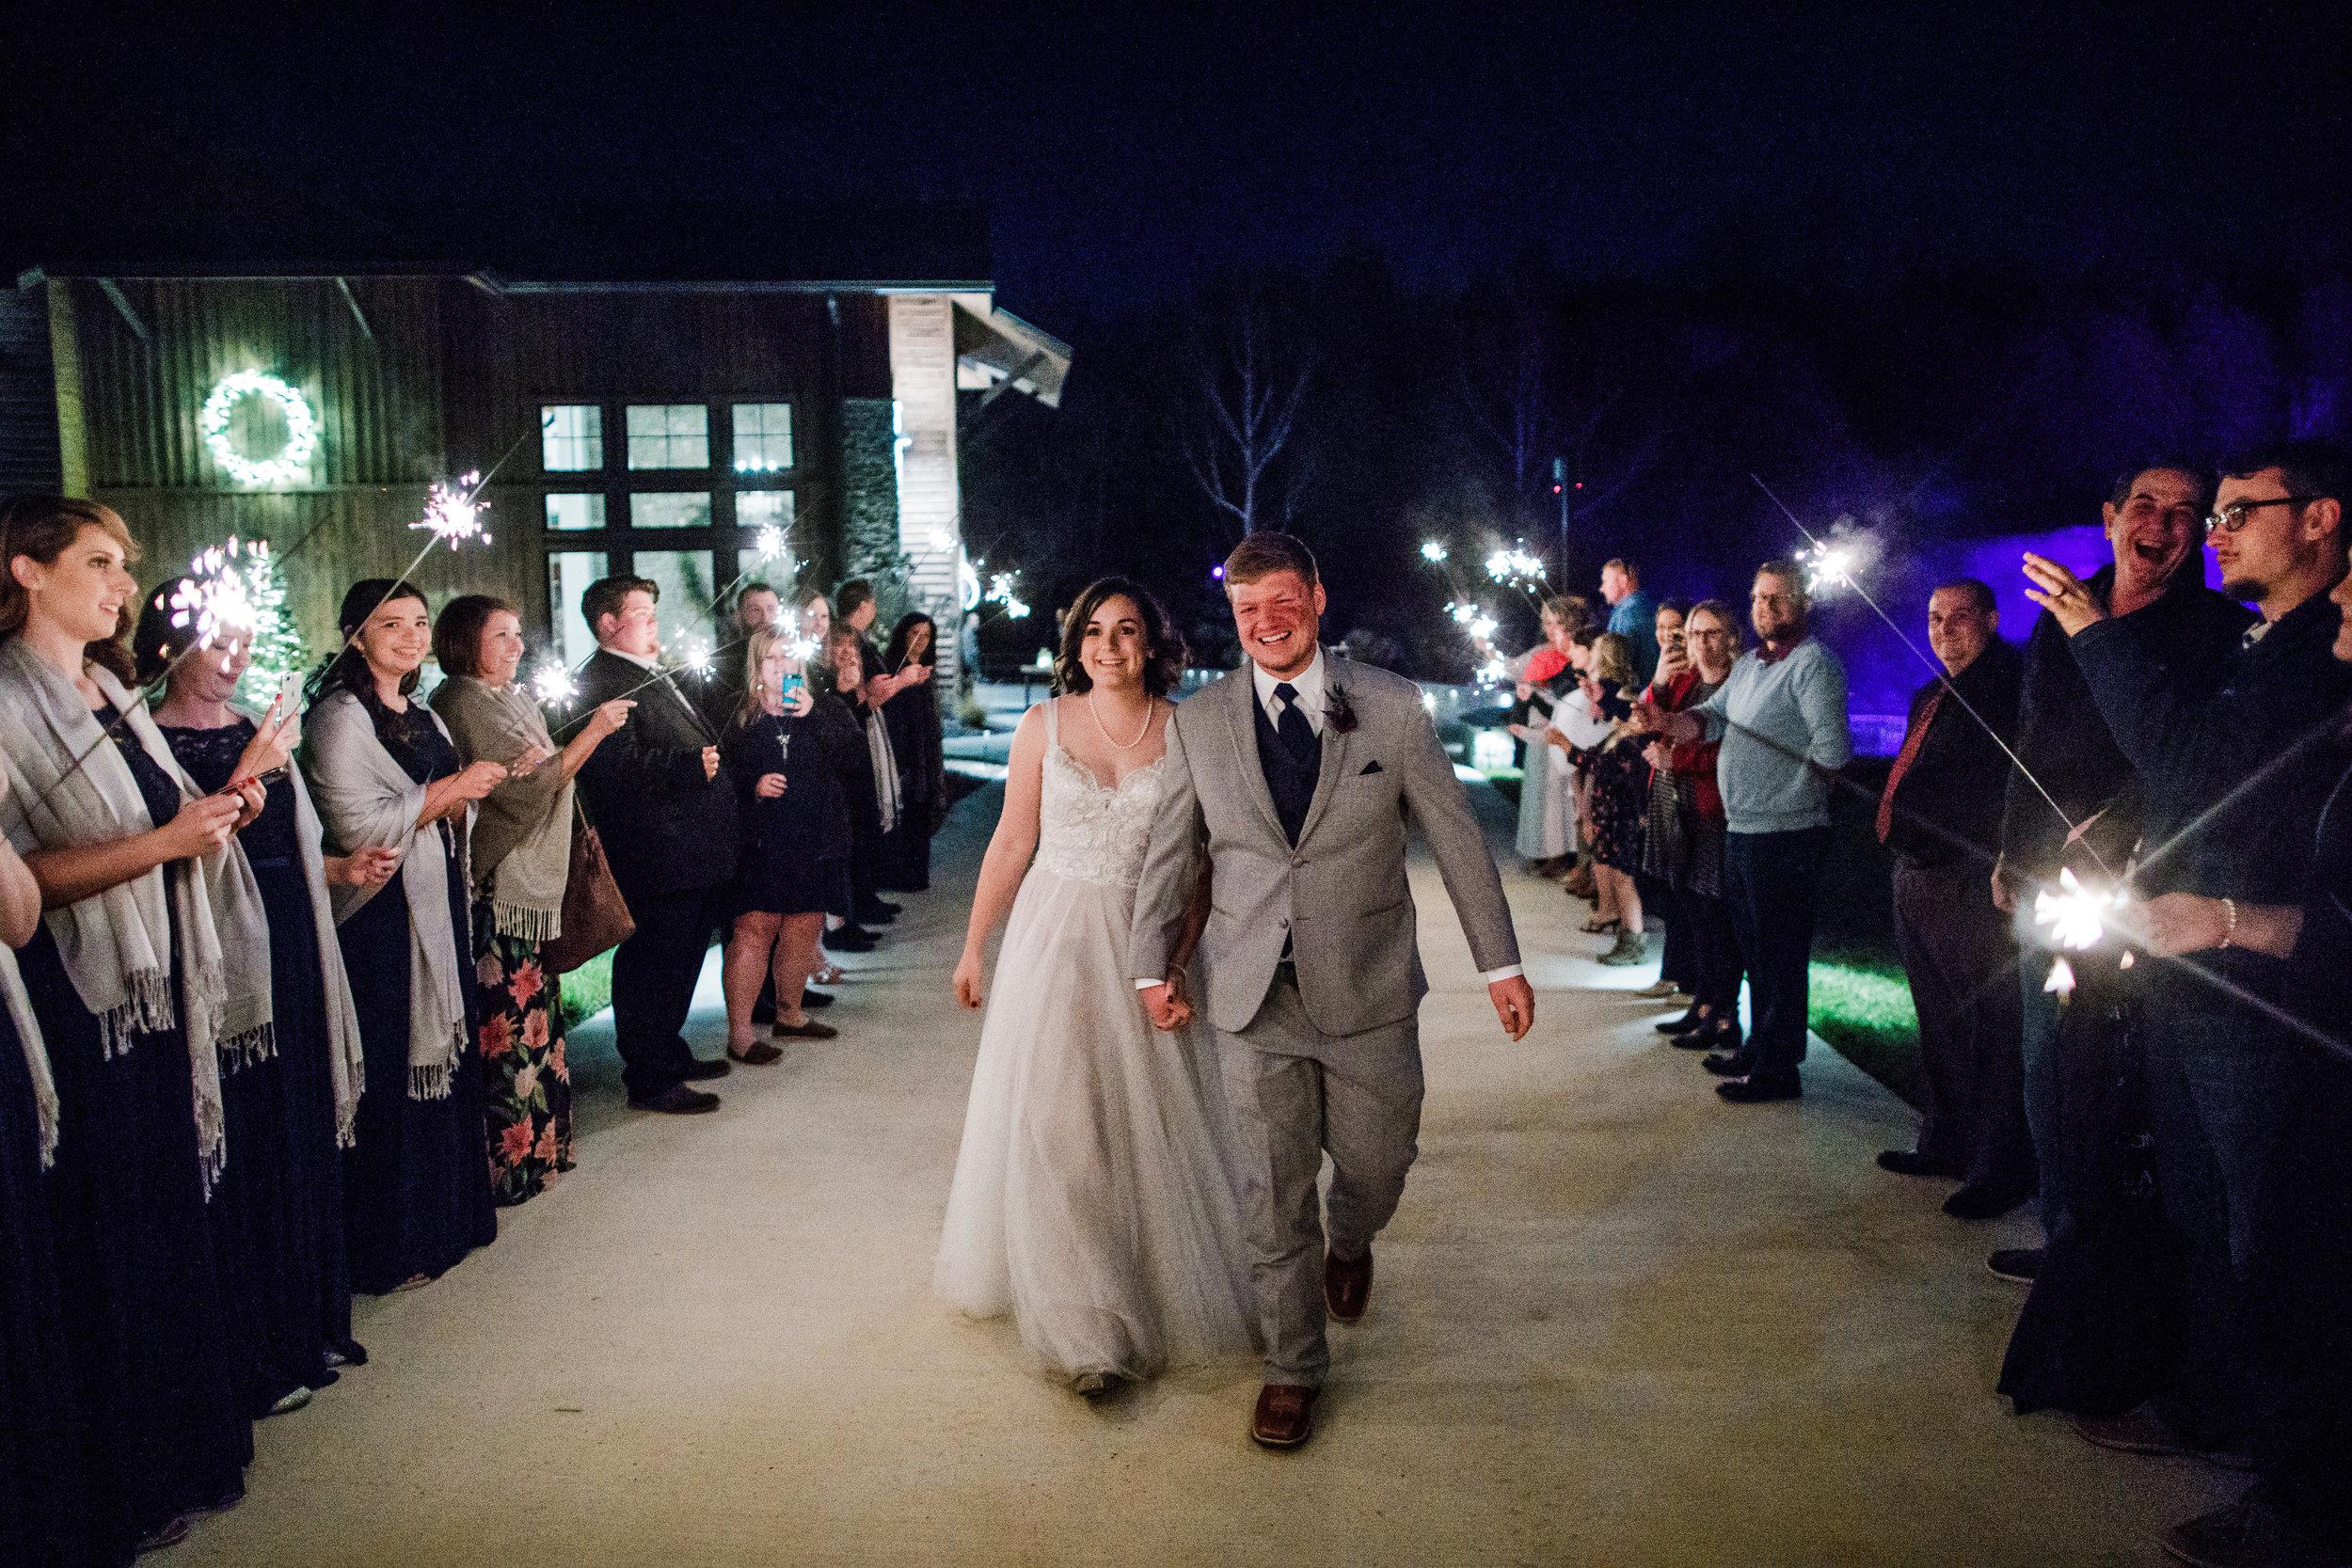 Graystone-Quarry-Wedding 91.jpg